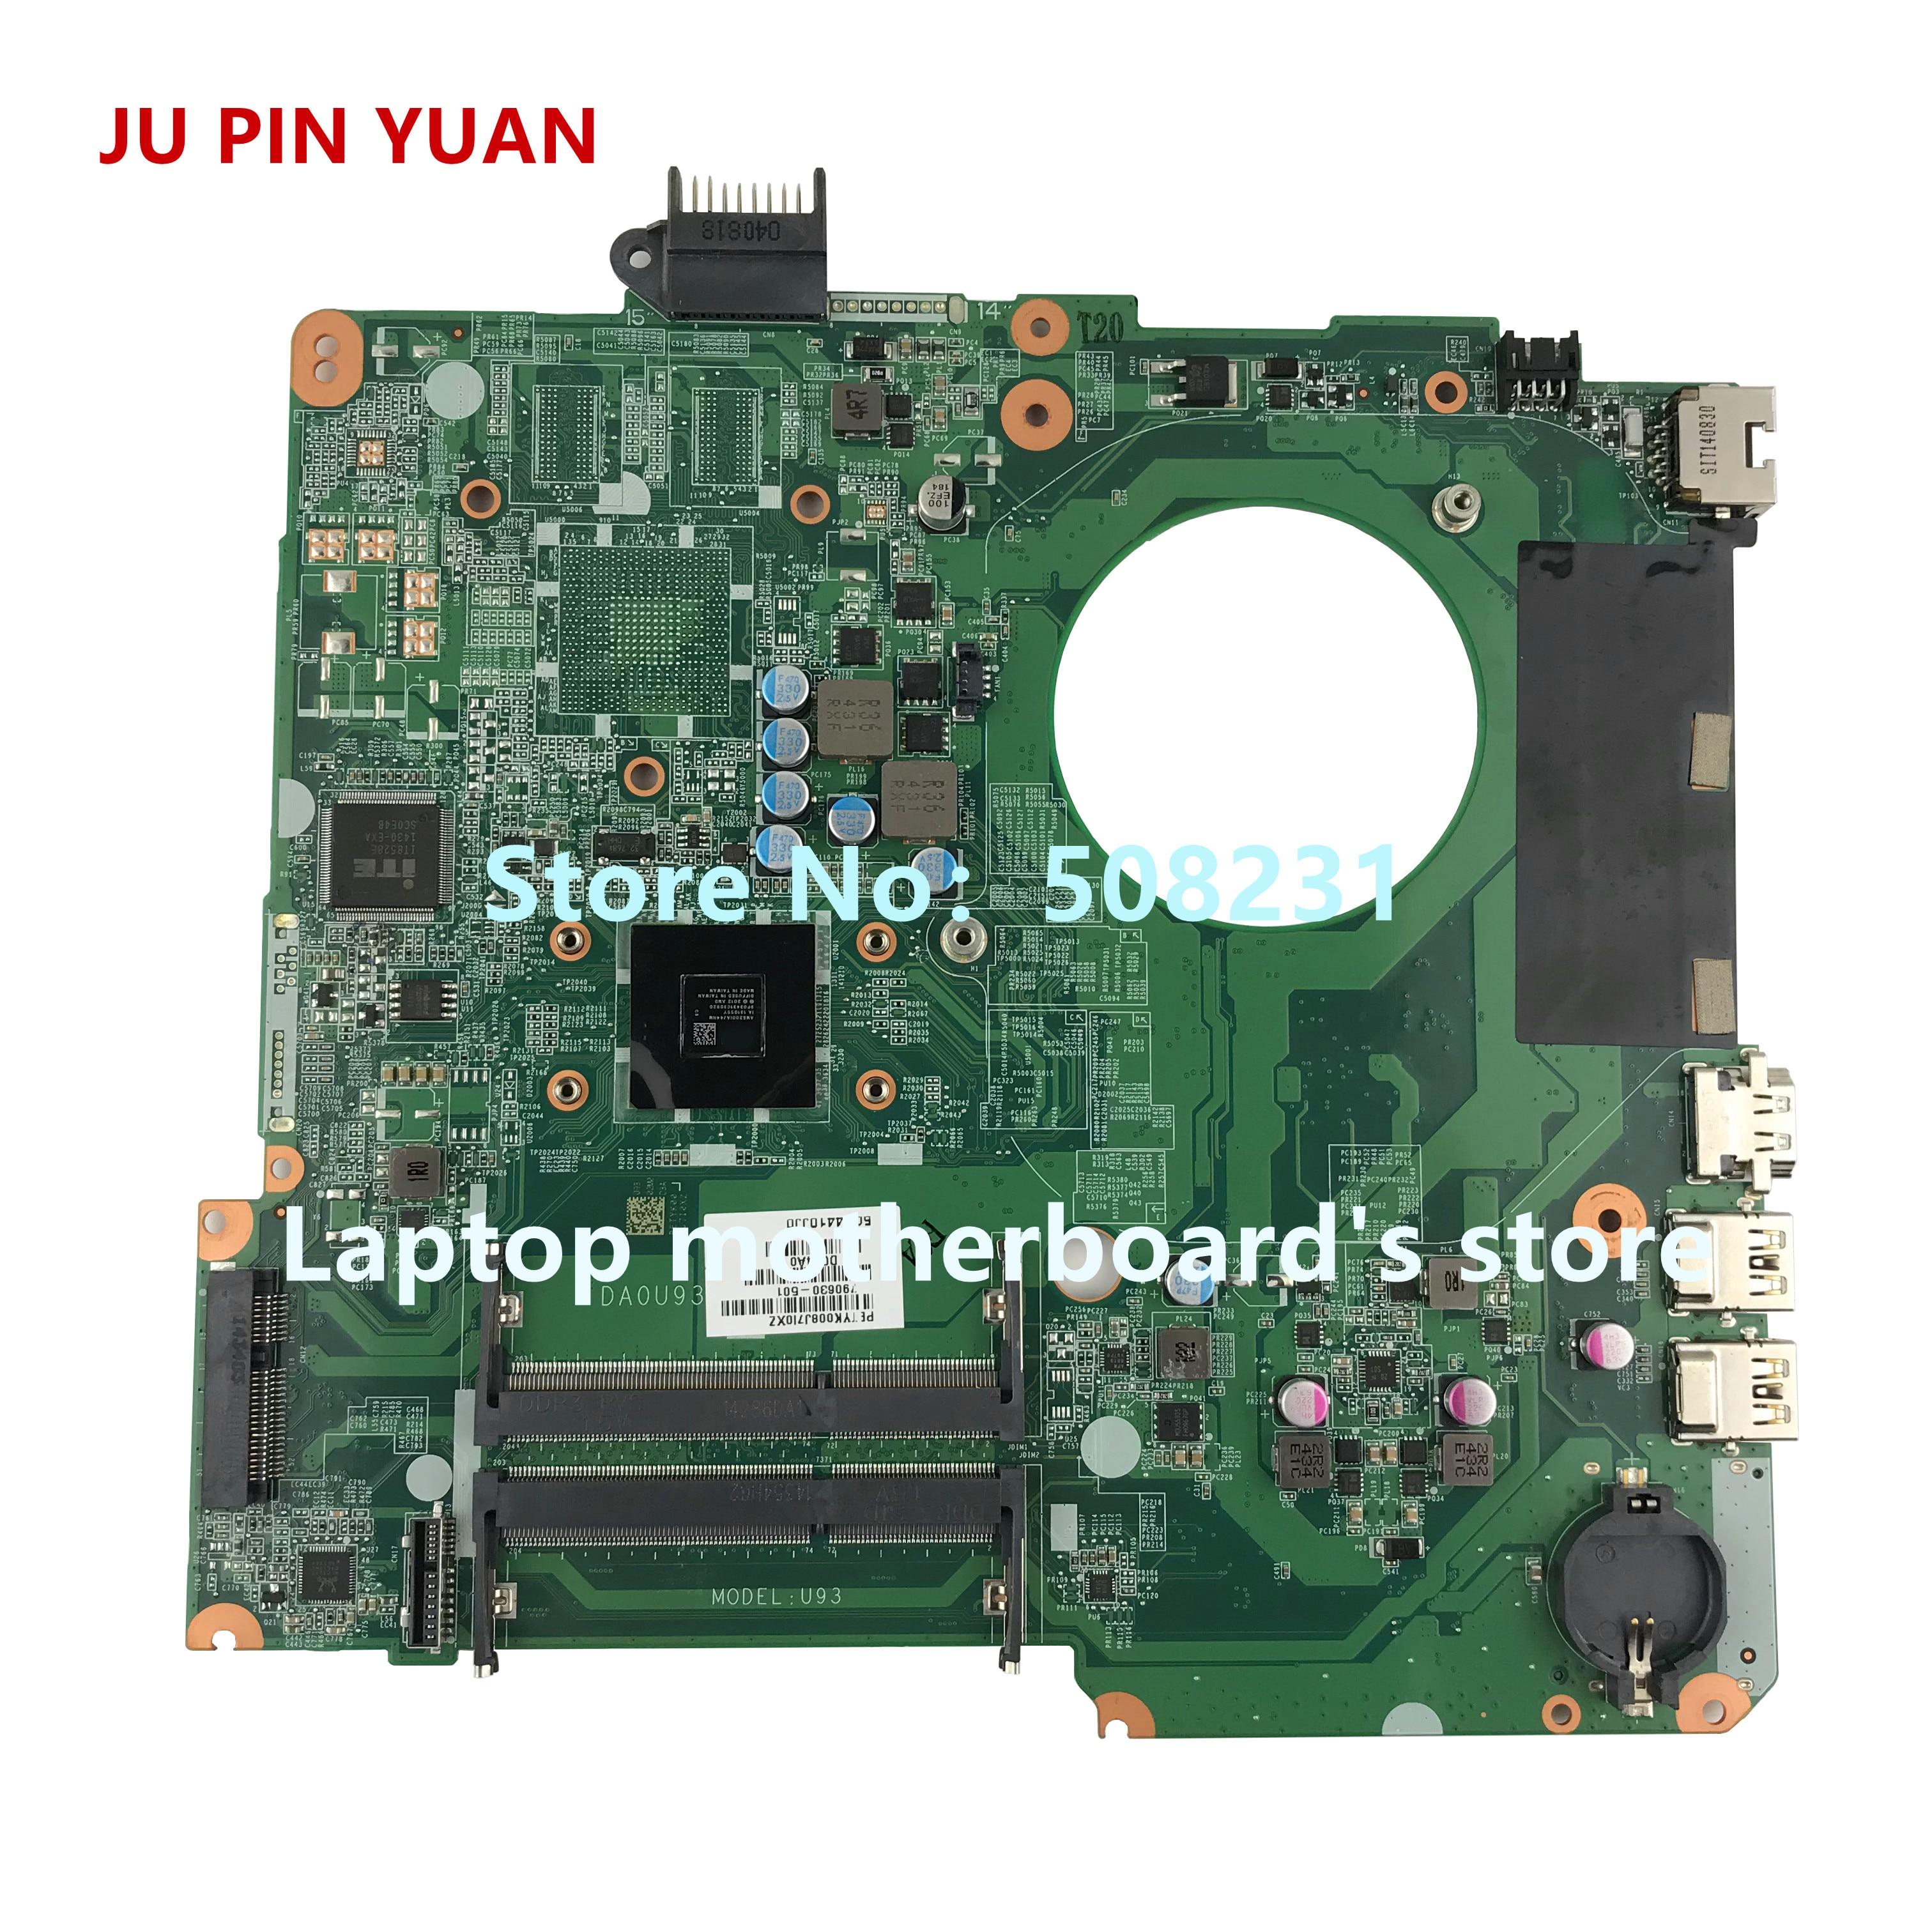 Ju pin Yuan 790630-501, 790630-001 U93 placa madre para HP PAVILION 15-N 15-F Placa base con A6-5200 CPU totalmente